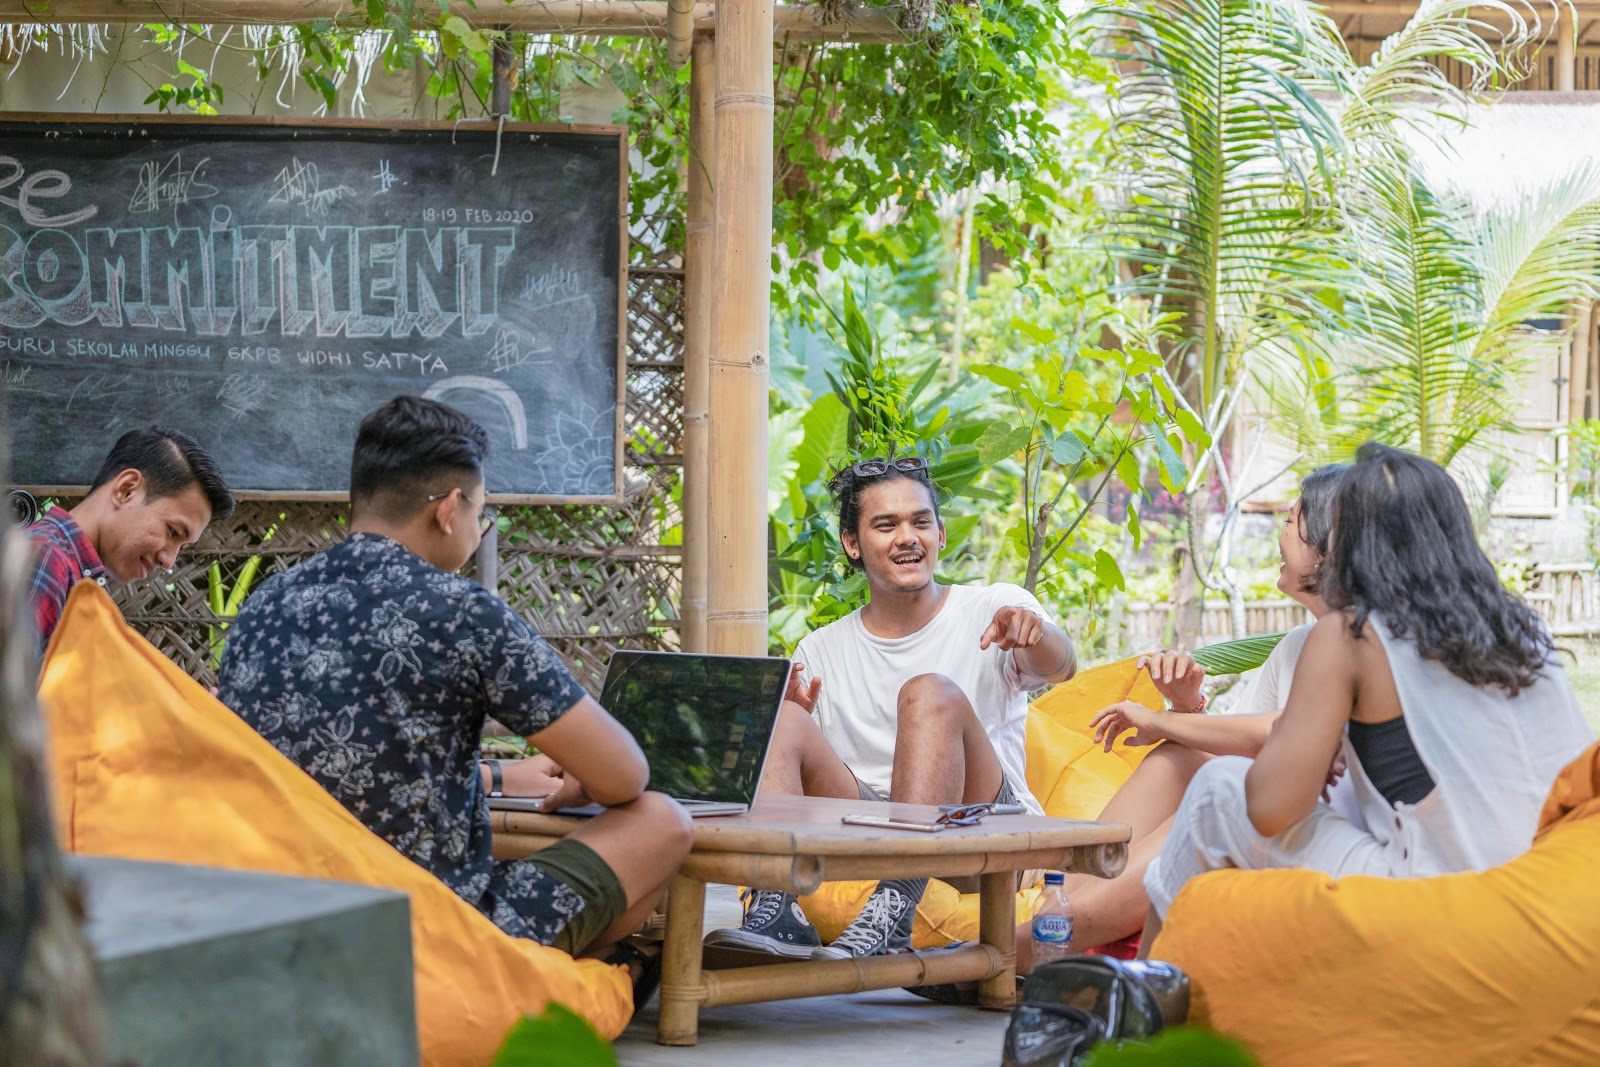 Benefit stay di hostel